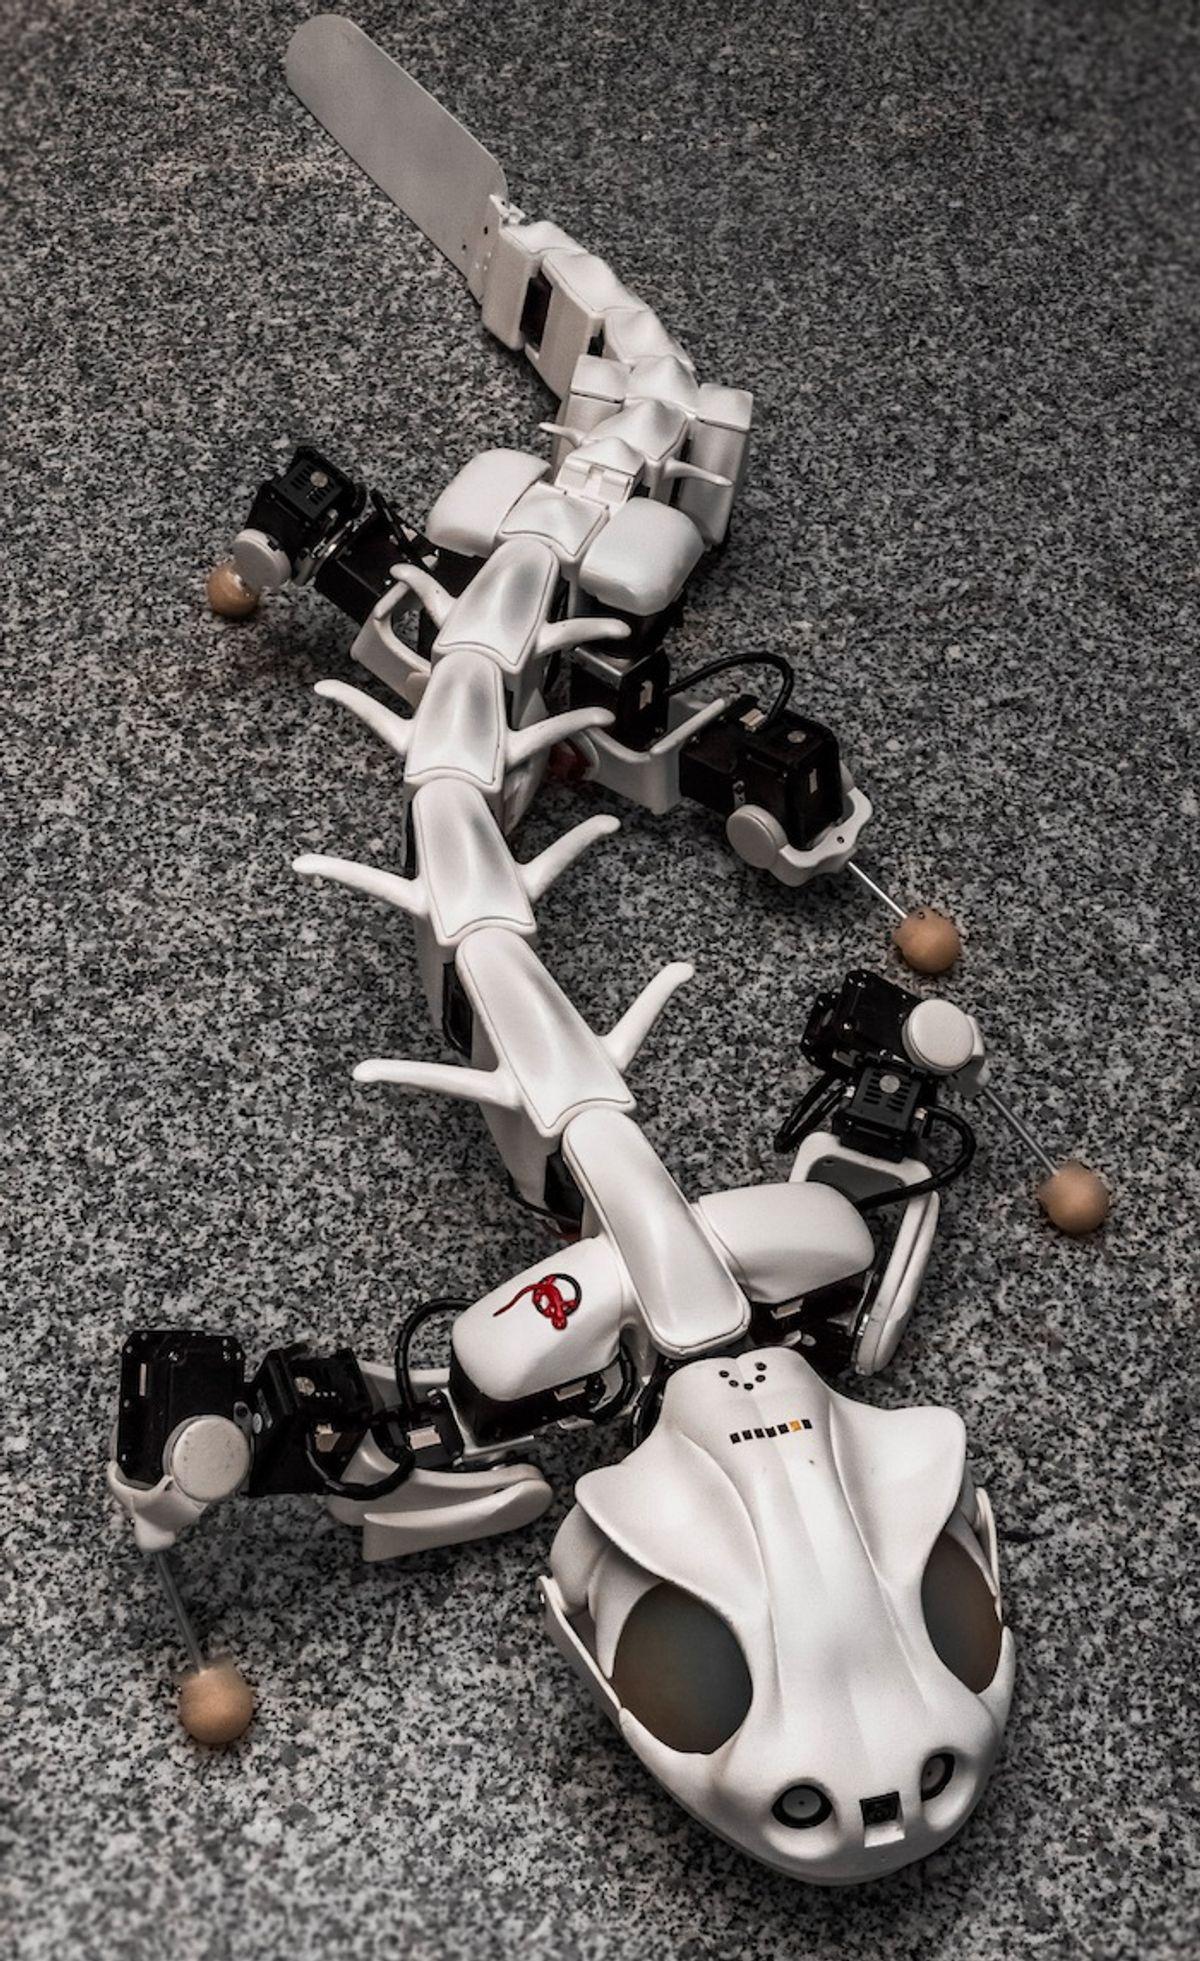 Pleurobot Is an Eerily Lifelike Robotic Salamander